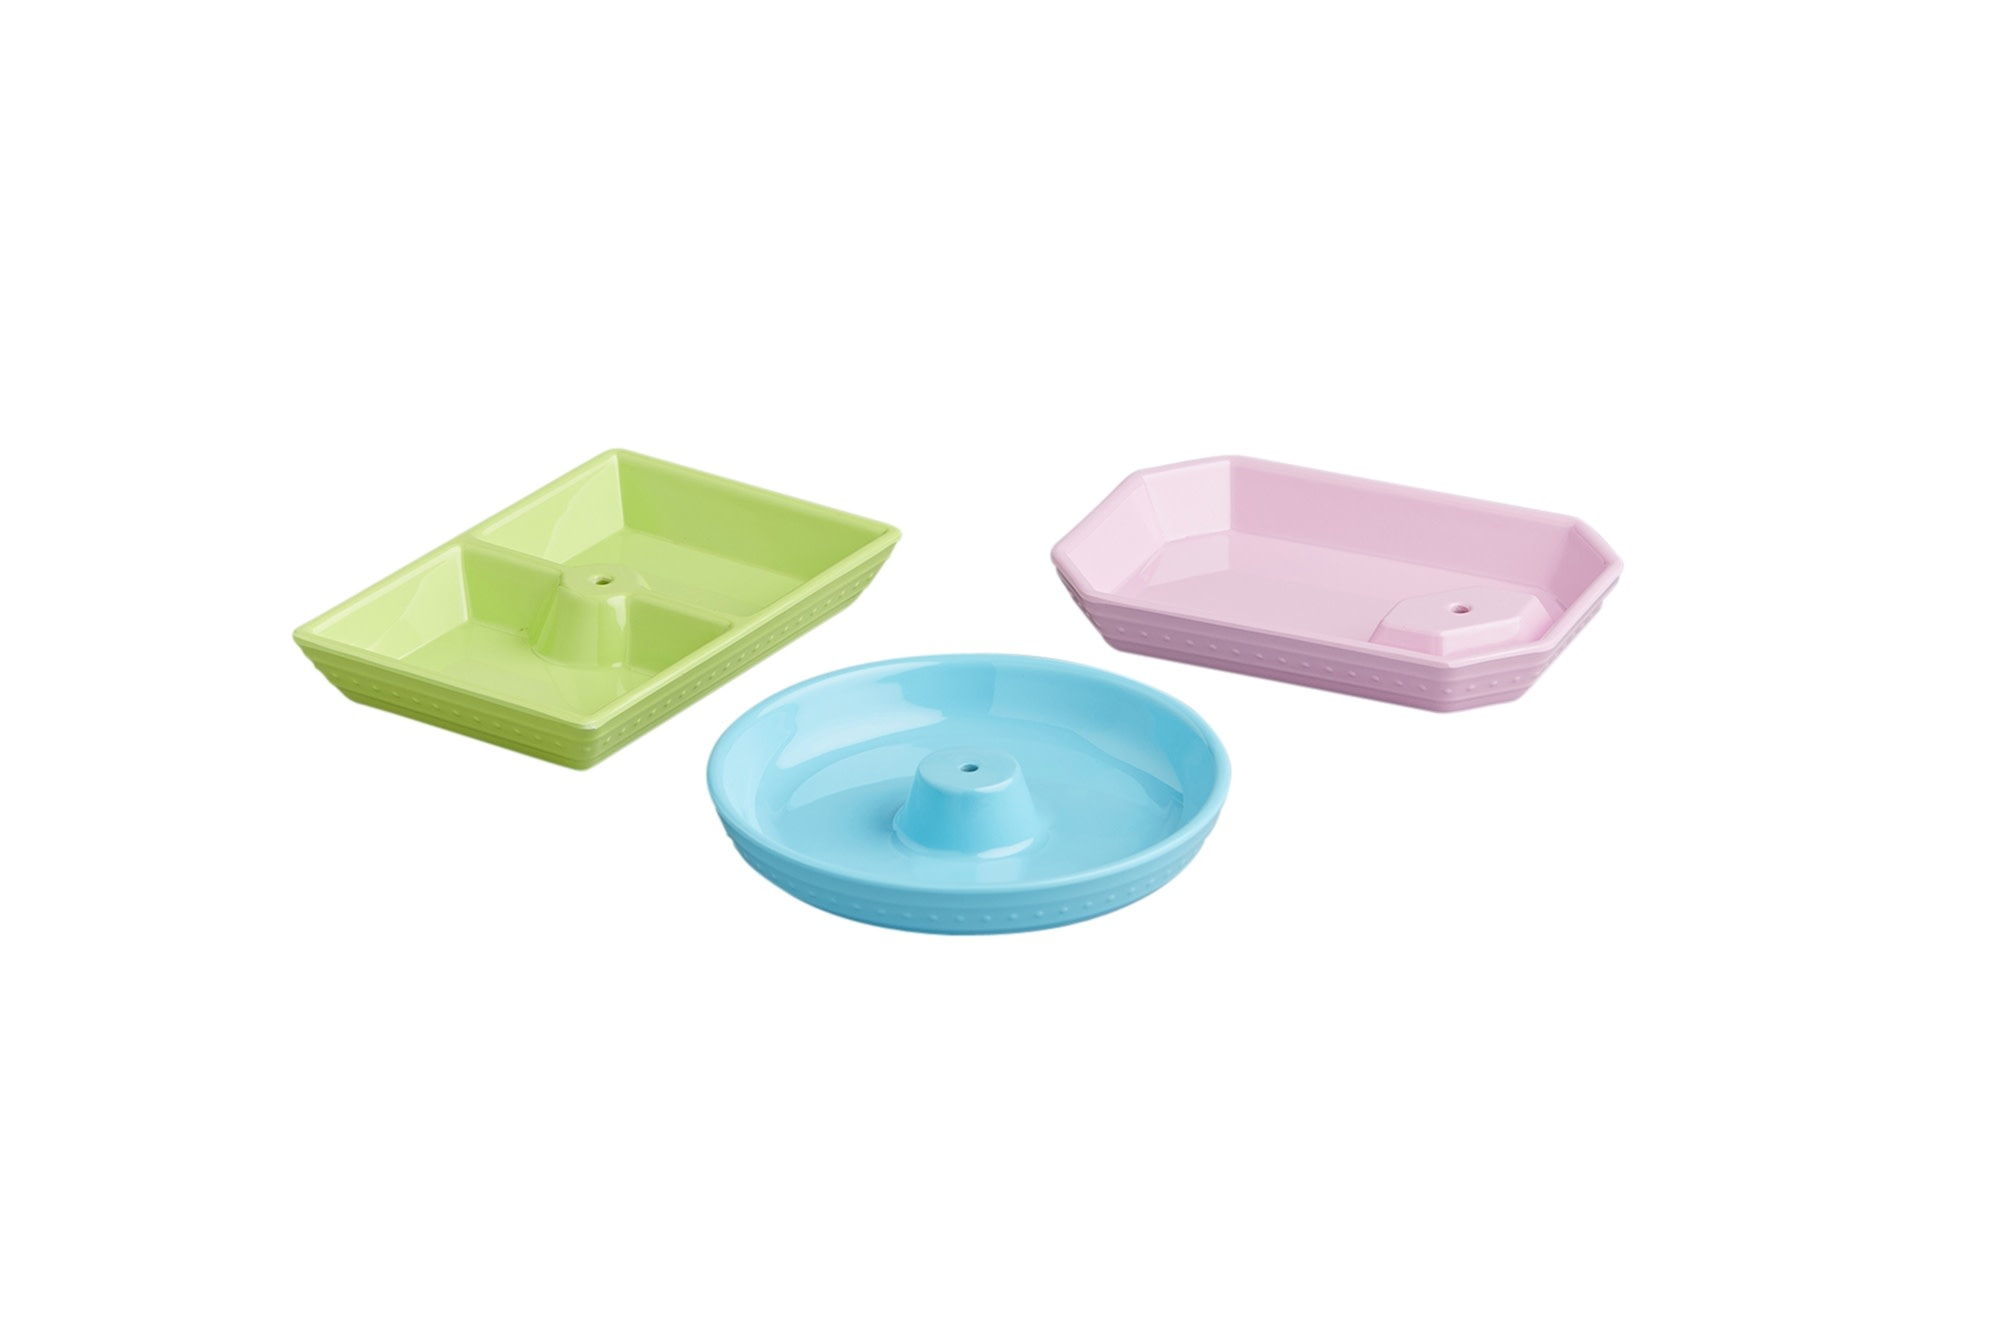 nora fleming melamine dainty dishes 3 piece set (pastels)